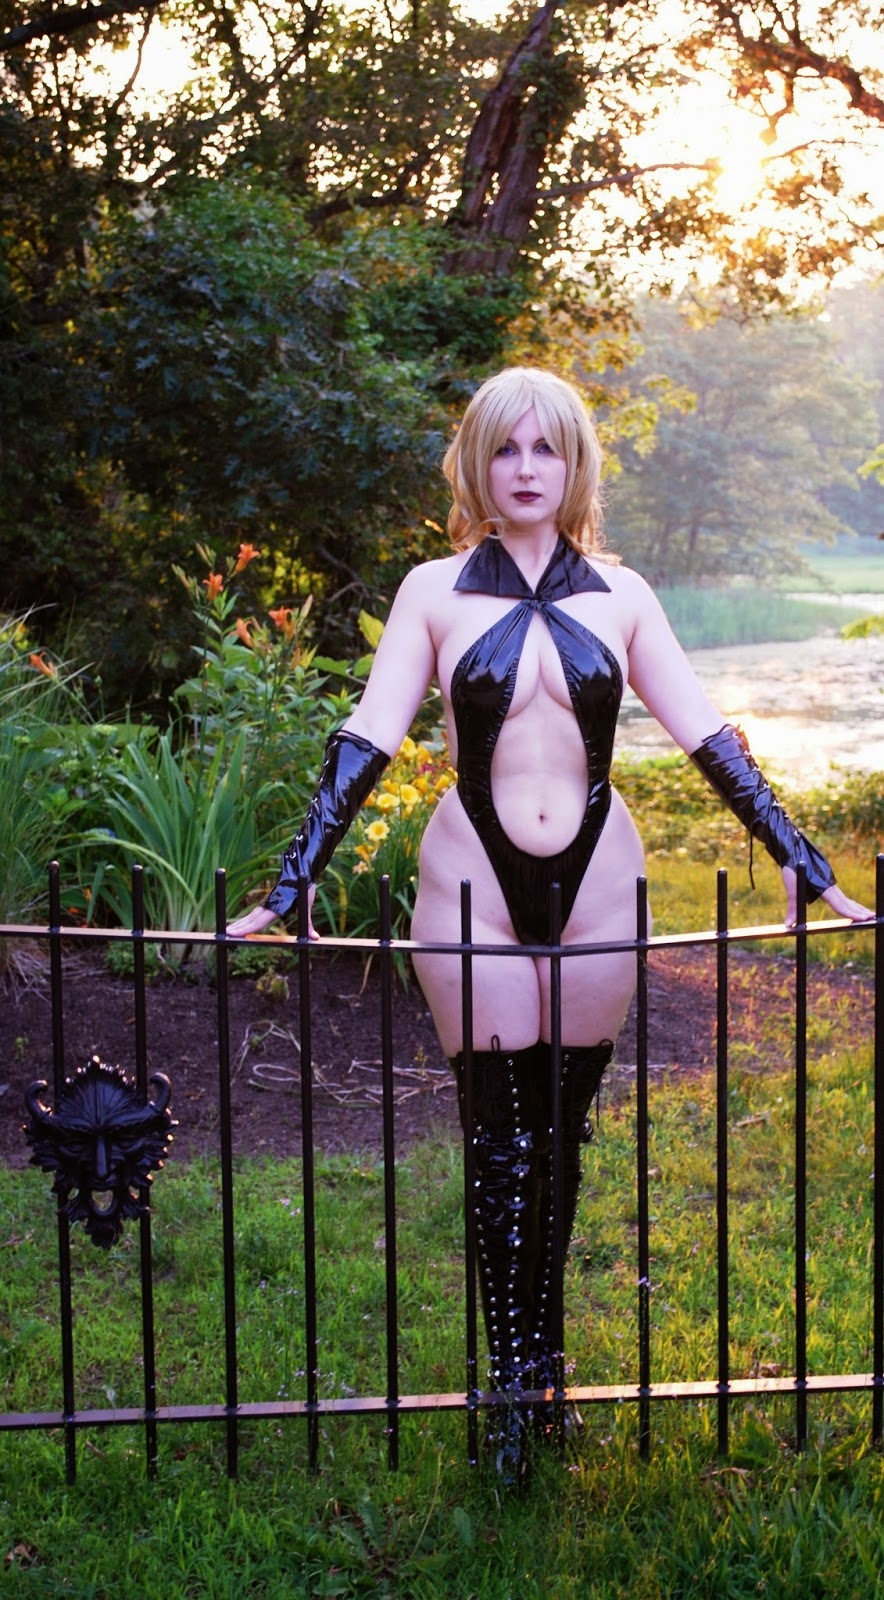 Draculina Waits (Vampirella's blonde twin sister) - (Panda Valentine)